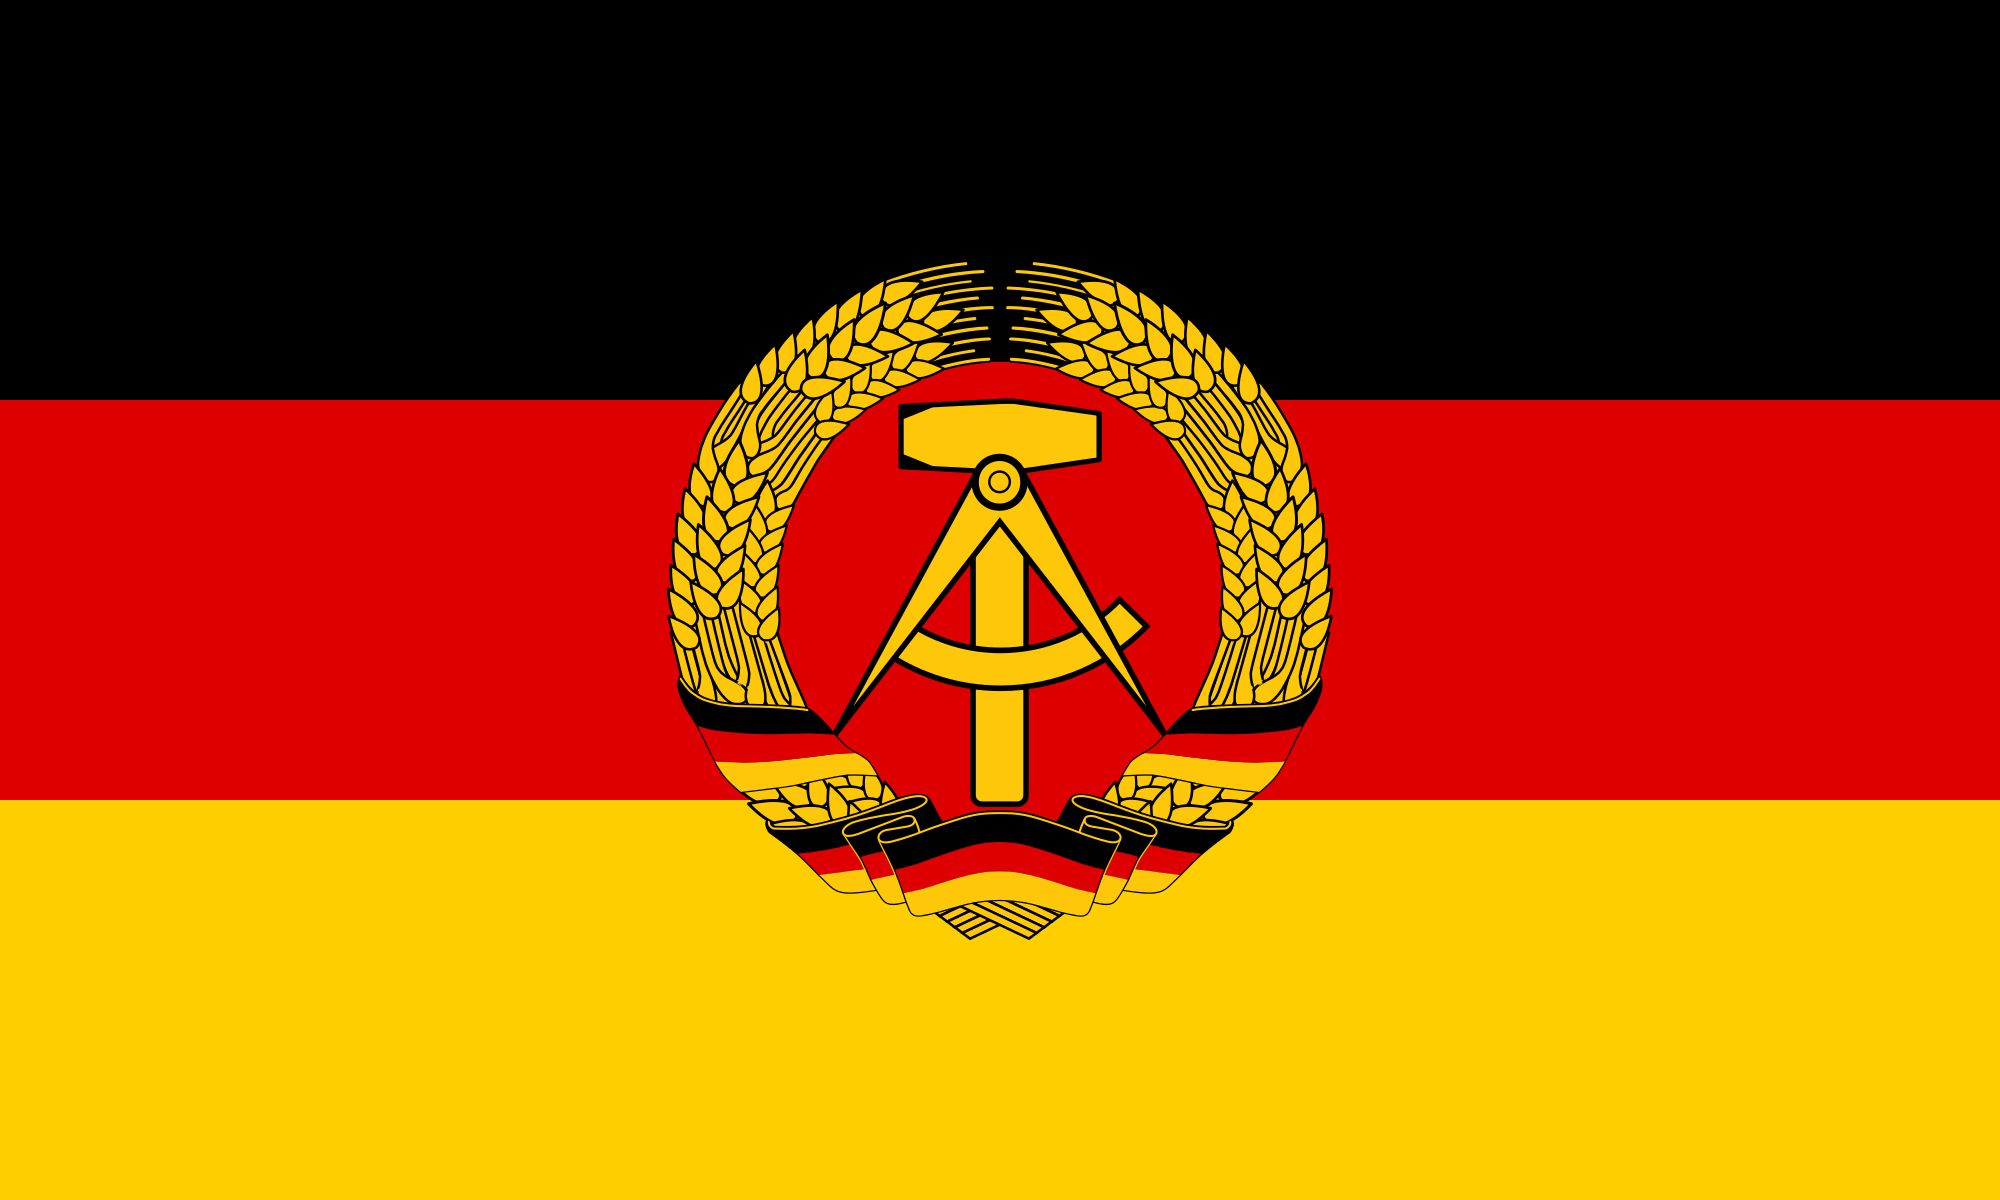 """Zwischen Nacht und Tag"" (1975) Directed by Horst E. Brandt East Germany/Yugoslavia/USSR/France"